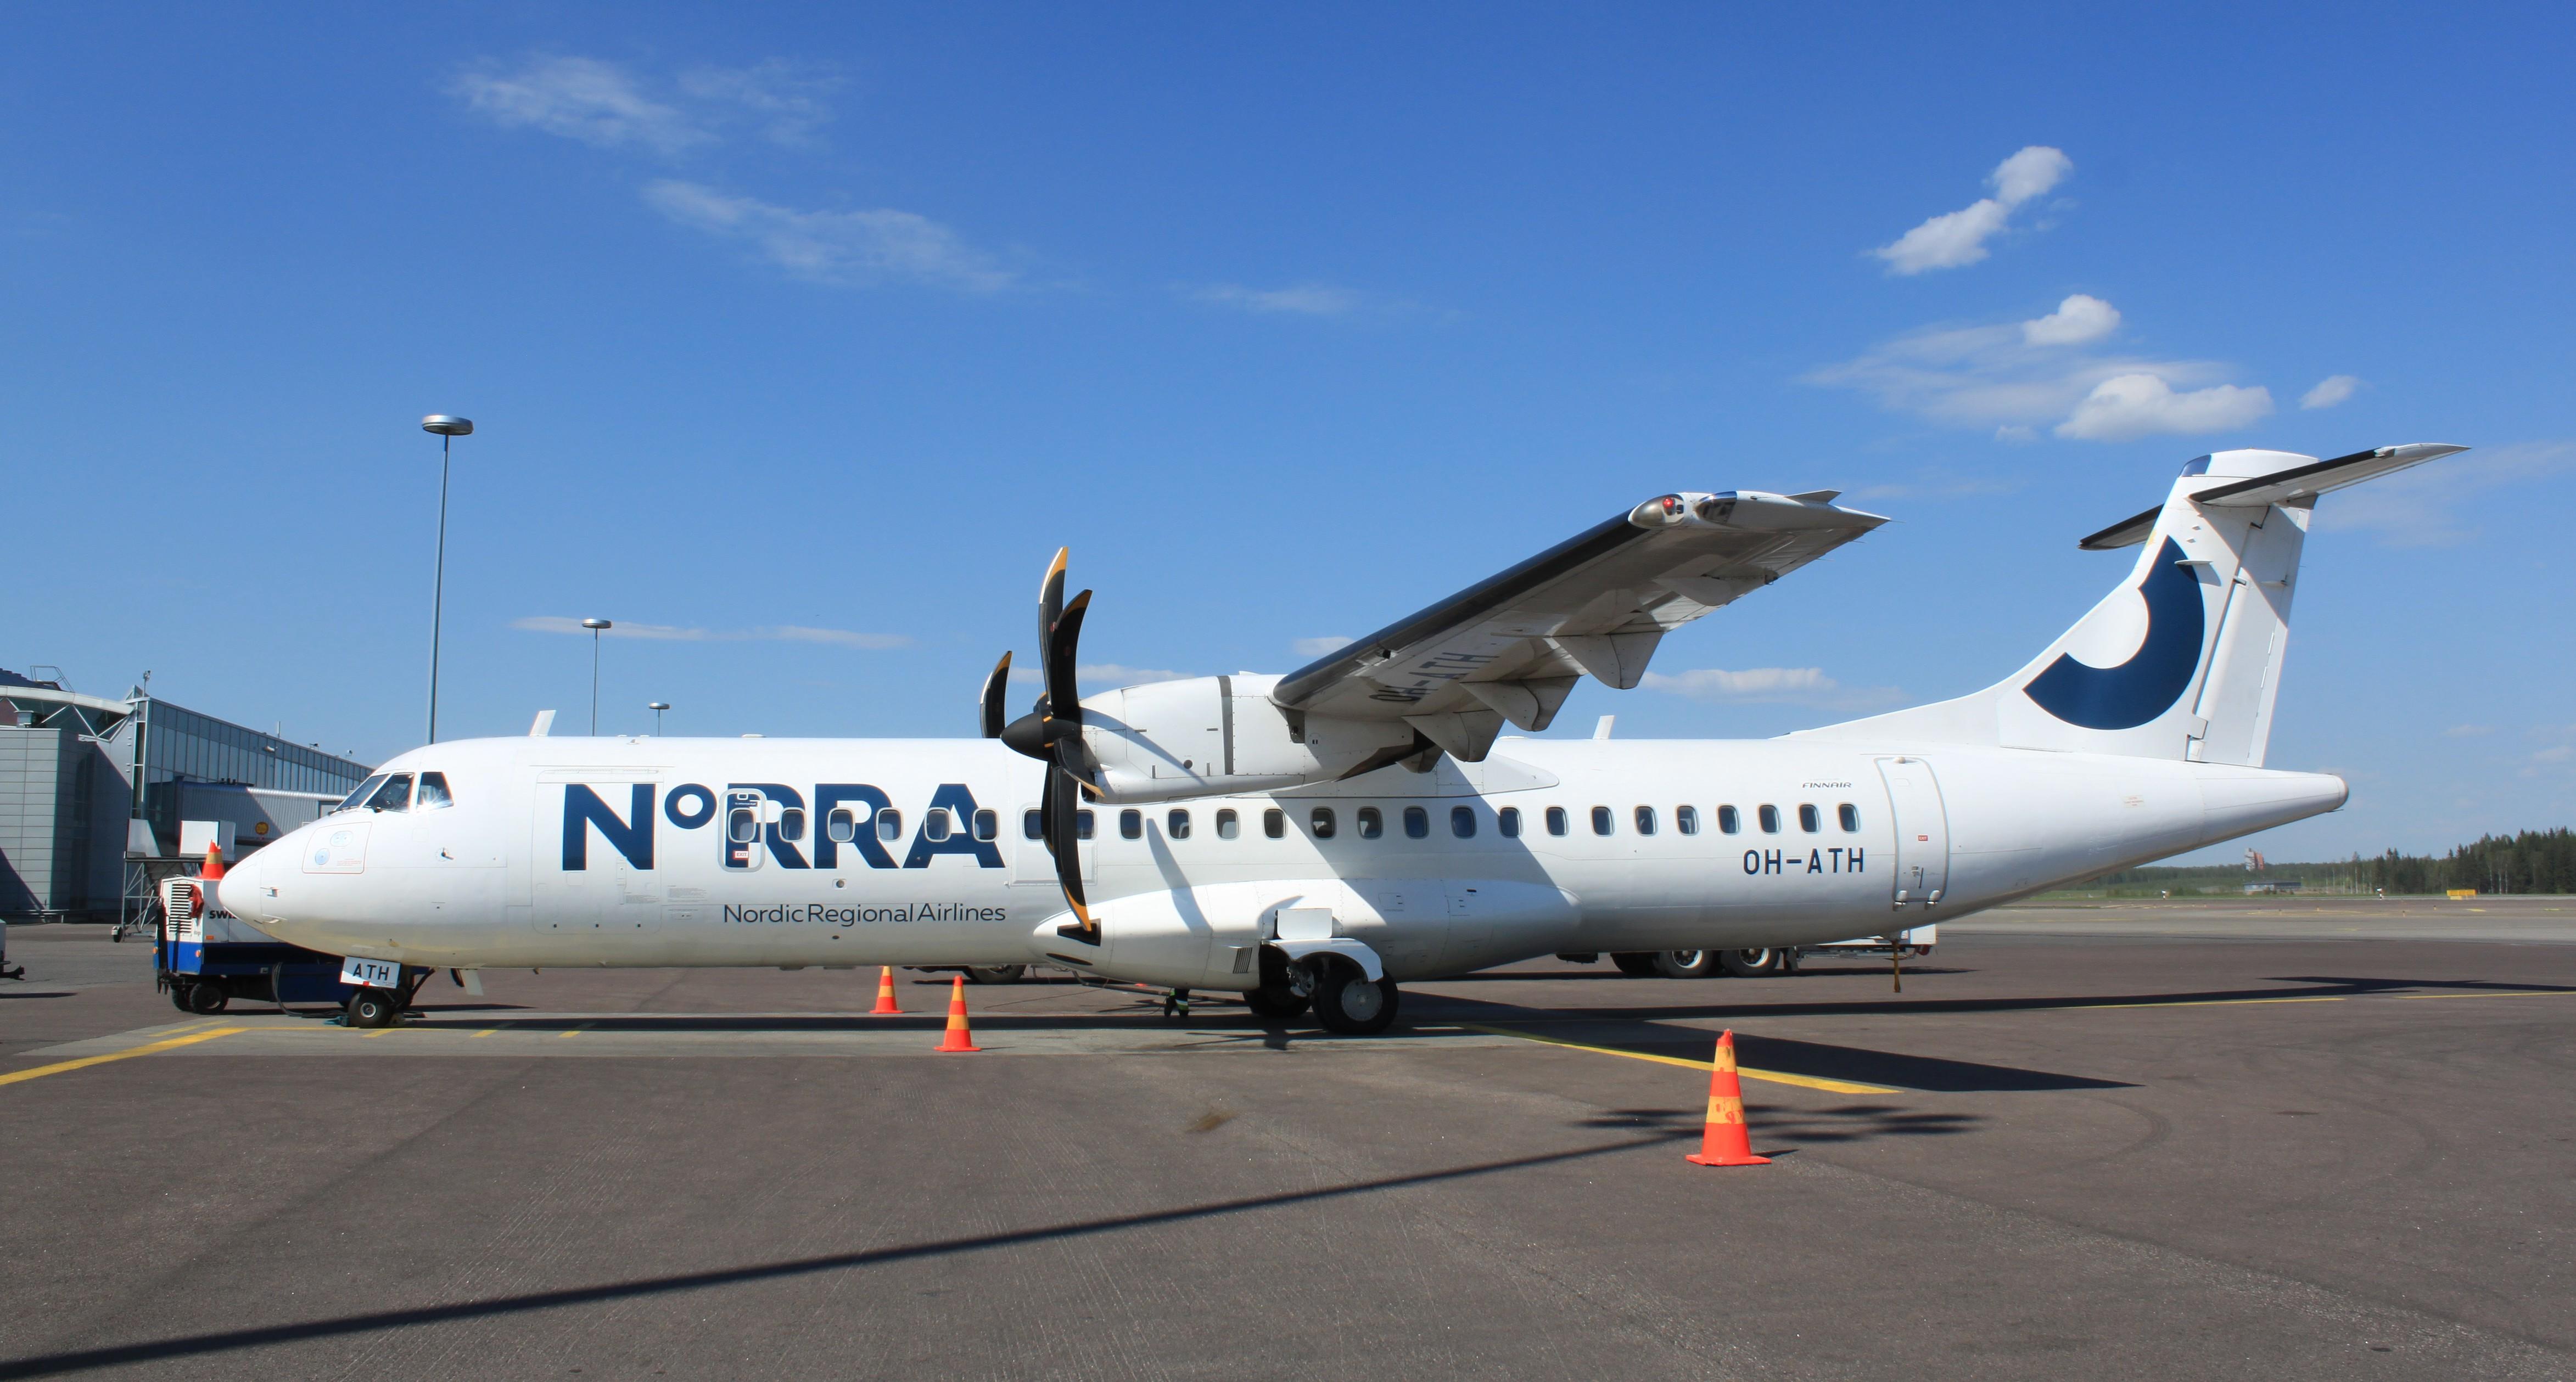 Norra ATR72-500 (Foto: Kaisa Huhtaniemi/Norra)